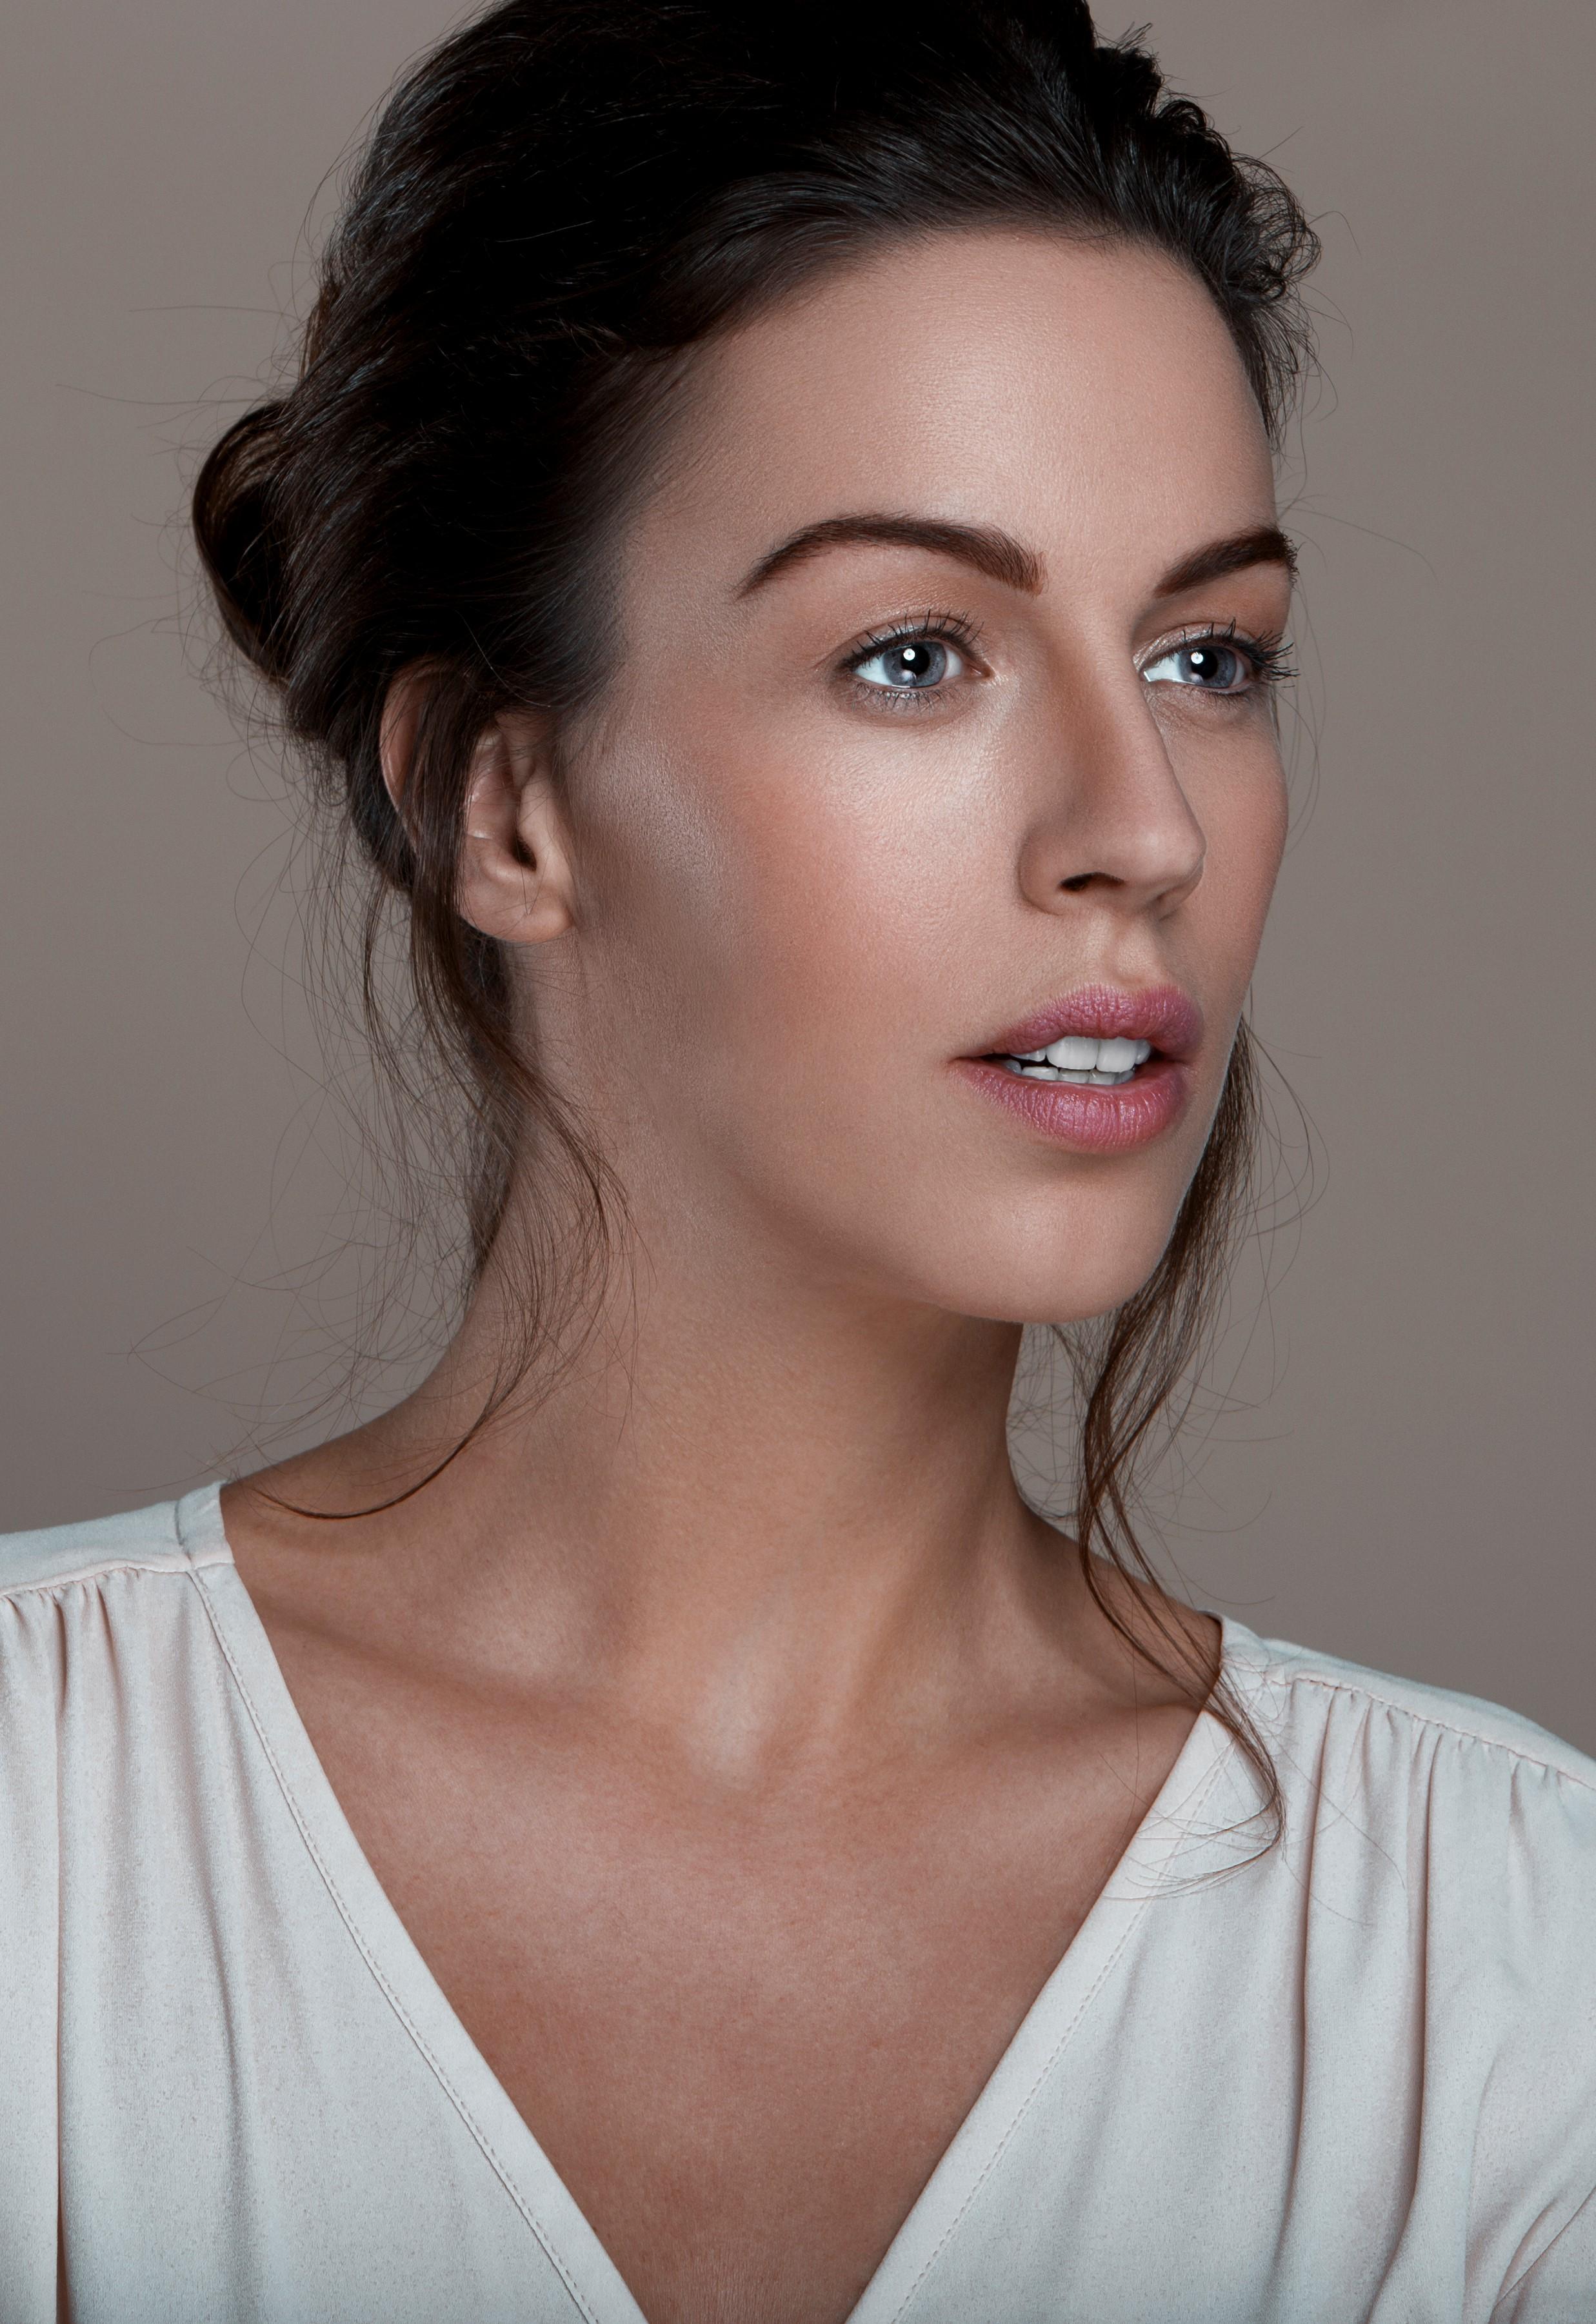 Shine-Female-London-Model-Siobhan-P-Plus-size-model-15.jpg#asset:44387